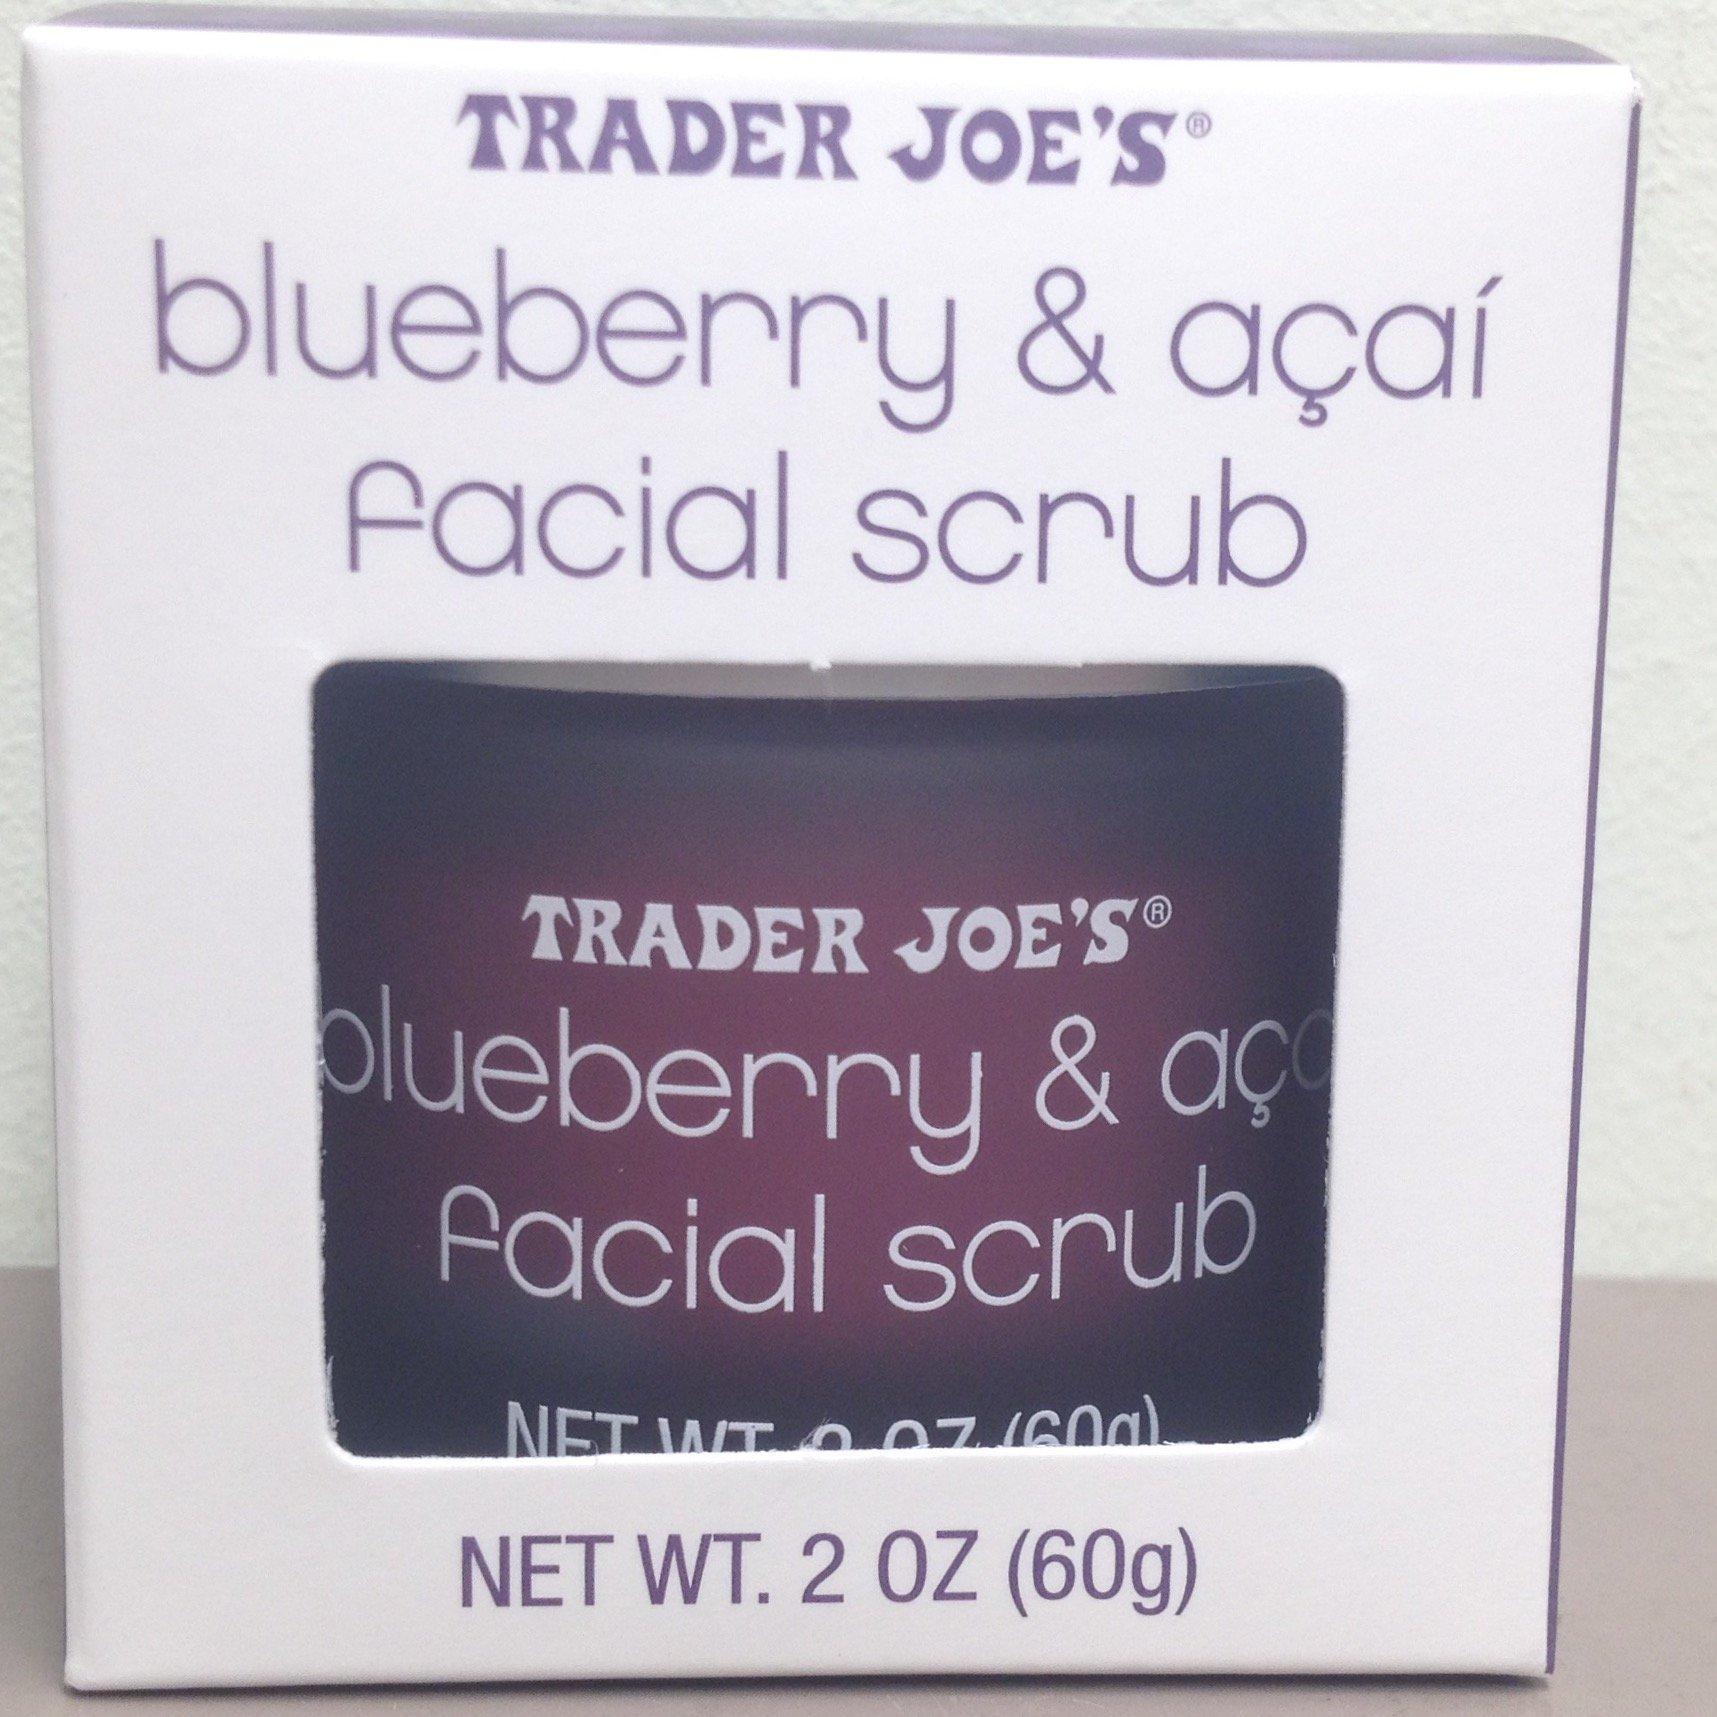 Trader Joe's - Trader Joe's Blueberry and Acai Facial Scrub, 2 Oz Jar